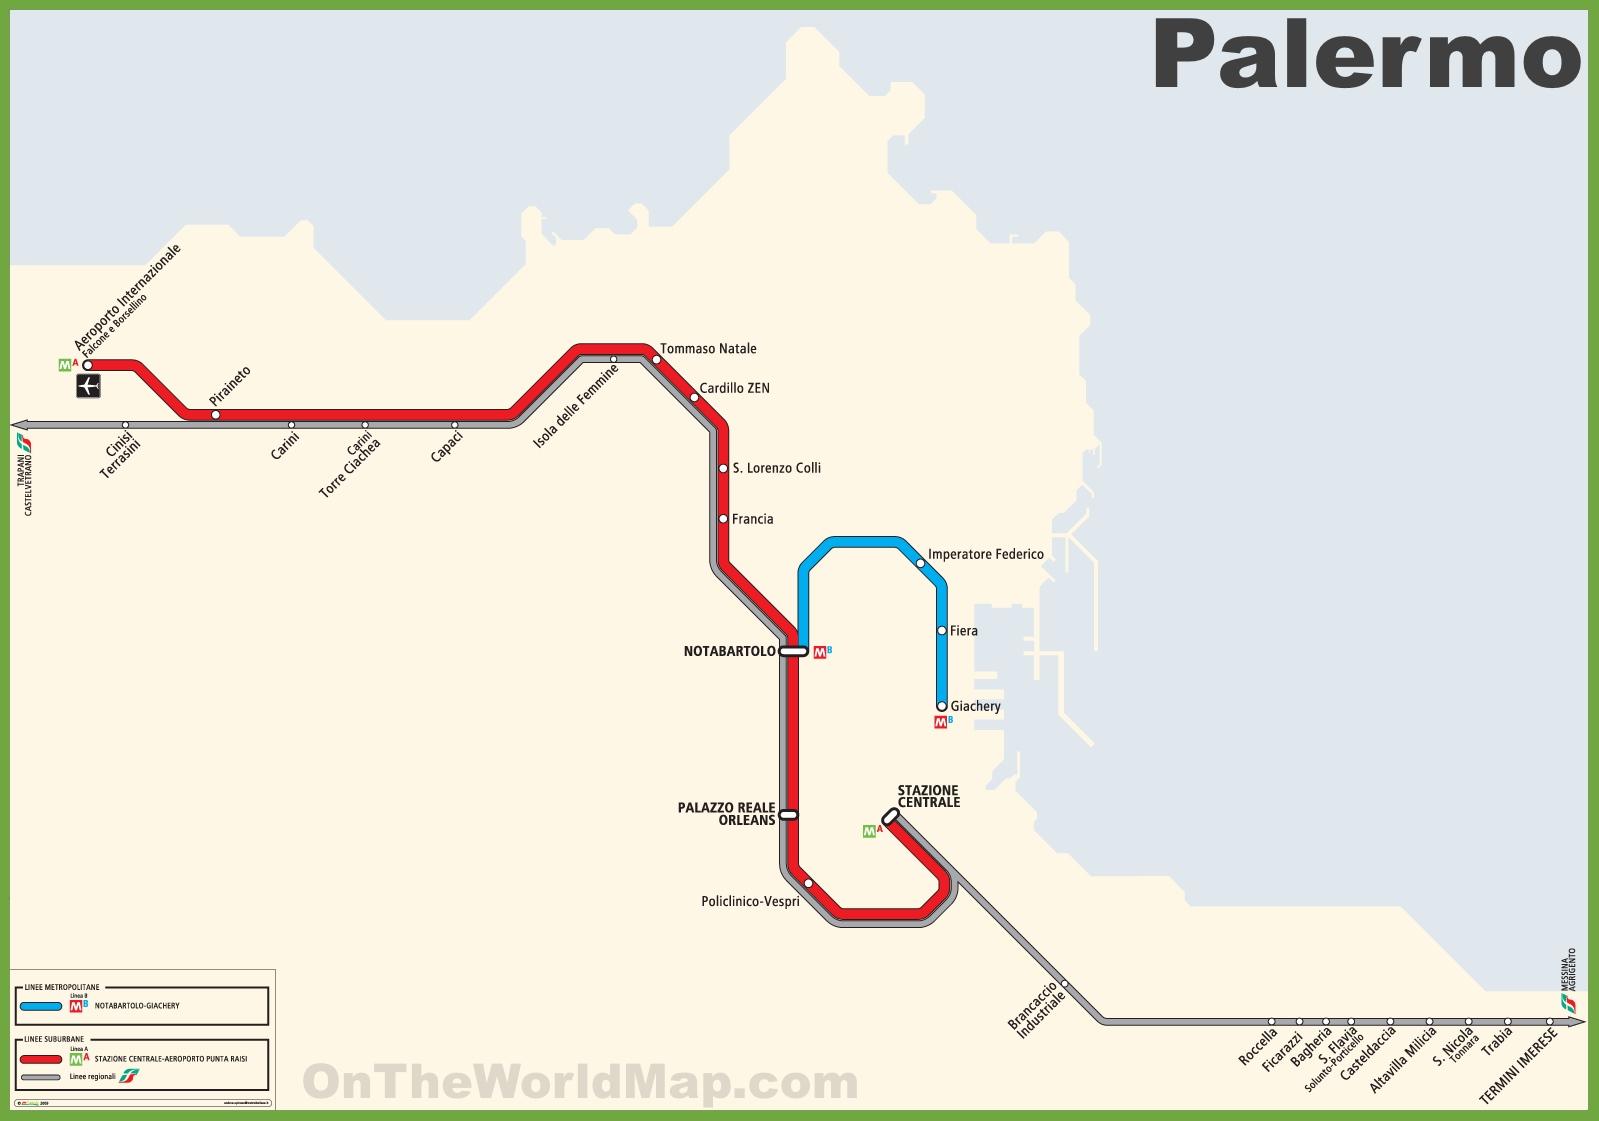 Italy Metro Map.Palermo Metro Map